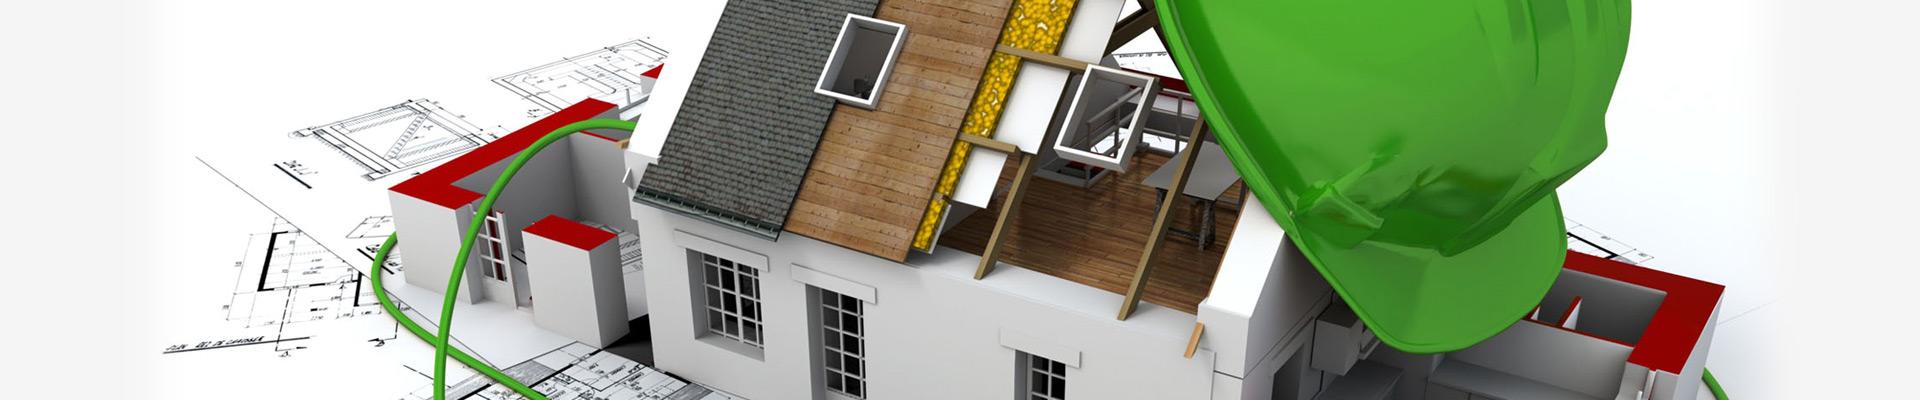 Arquitectos - DM Proyectos Técnicos